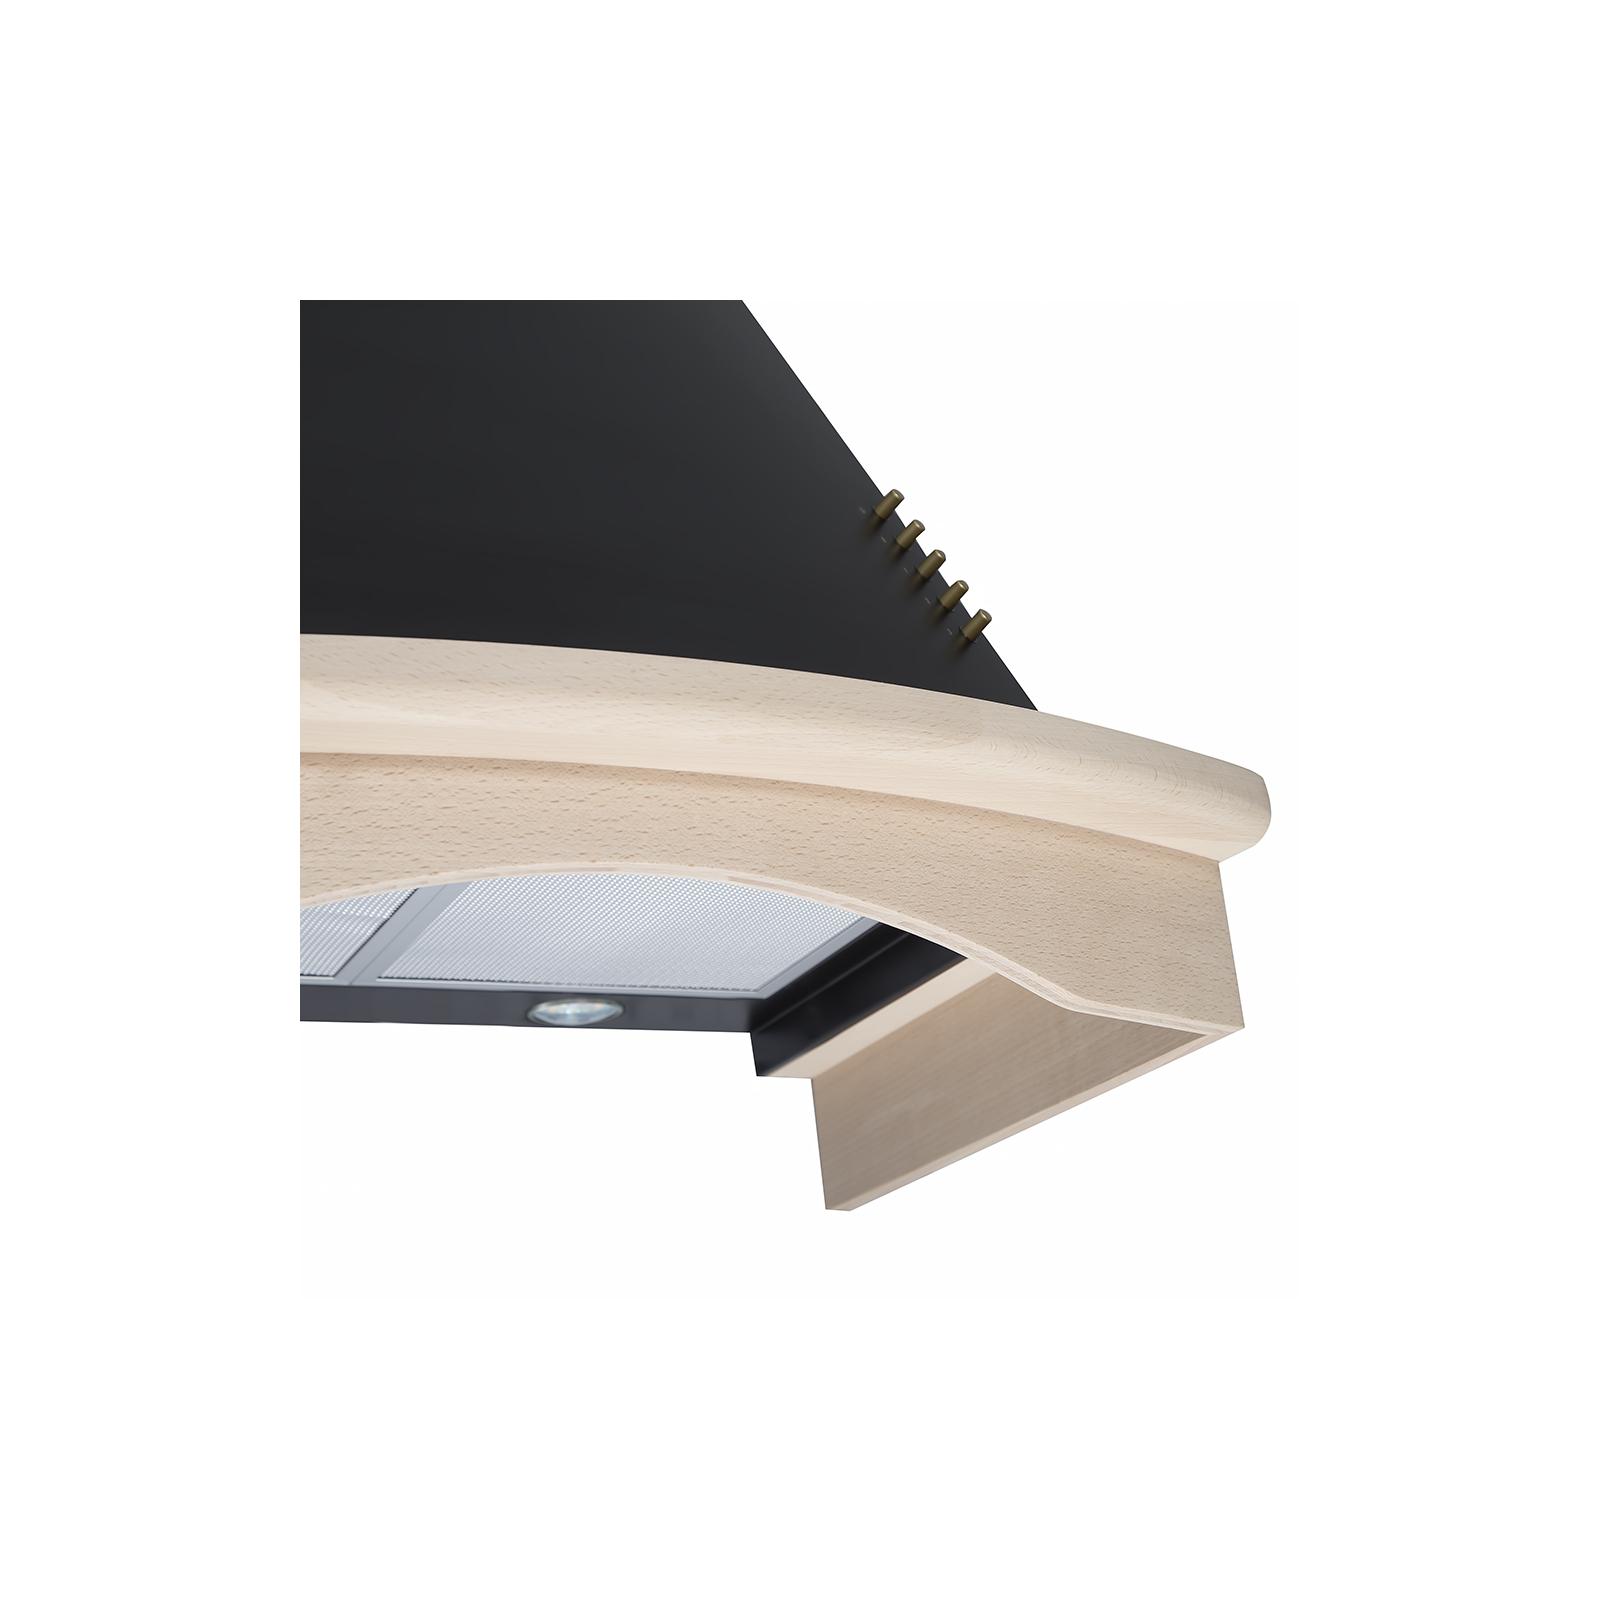 Вытяжка кухонная PERFELLI K 614 Black Country LED изображение 3